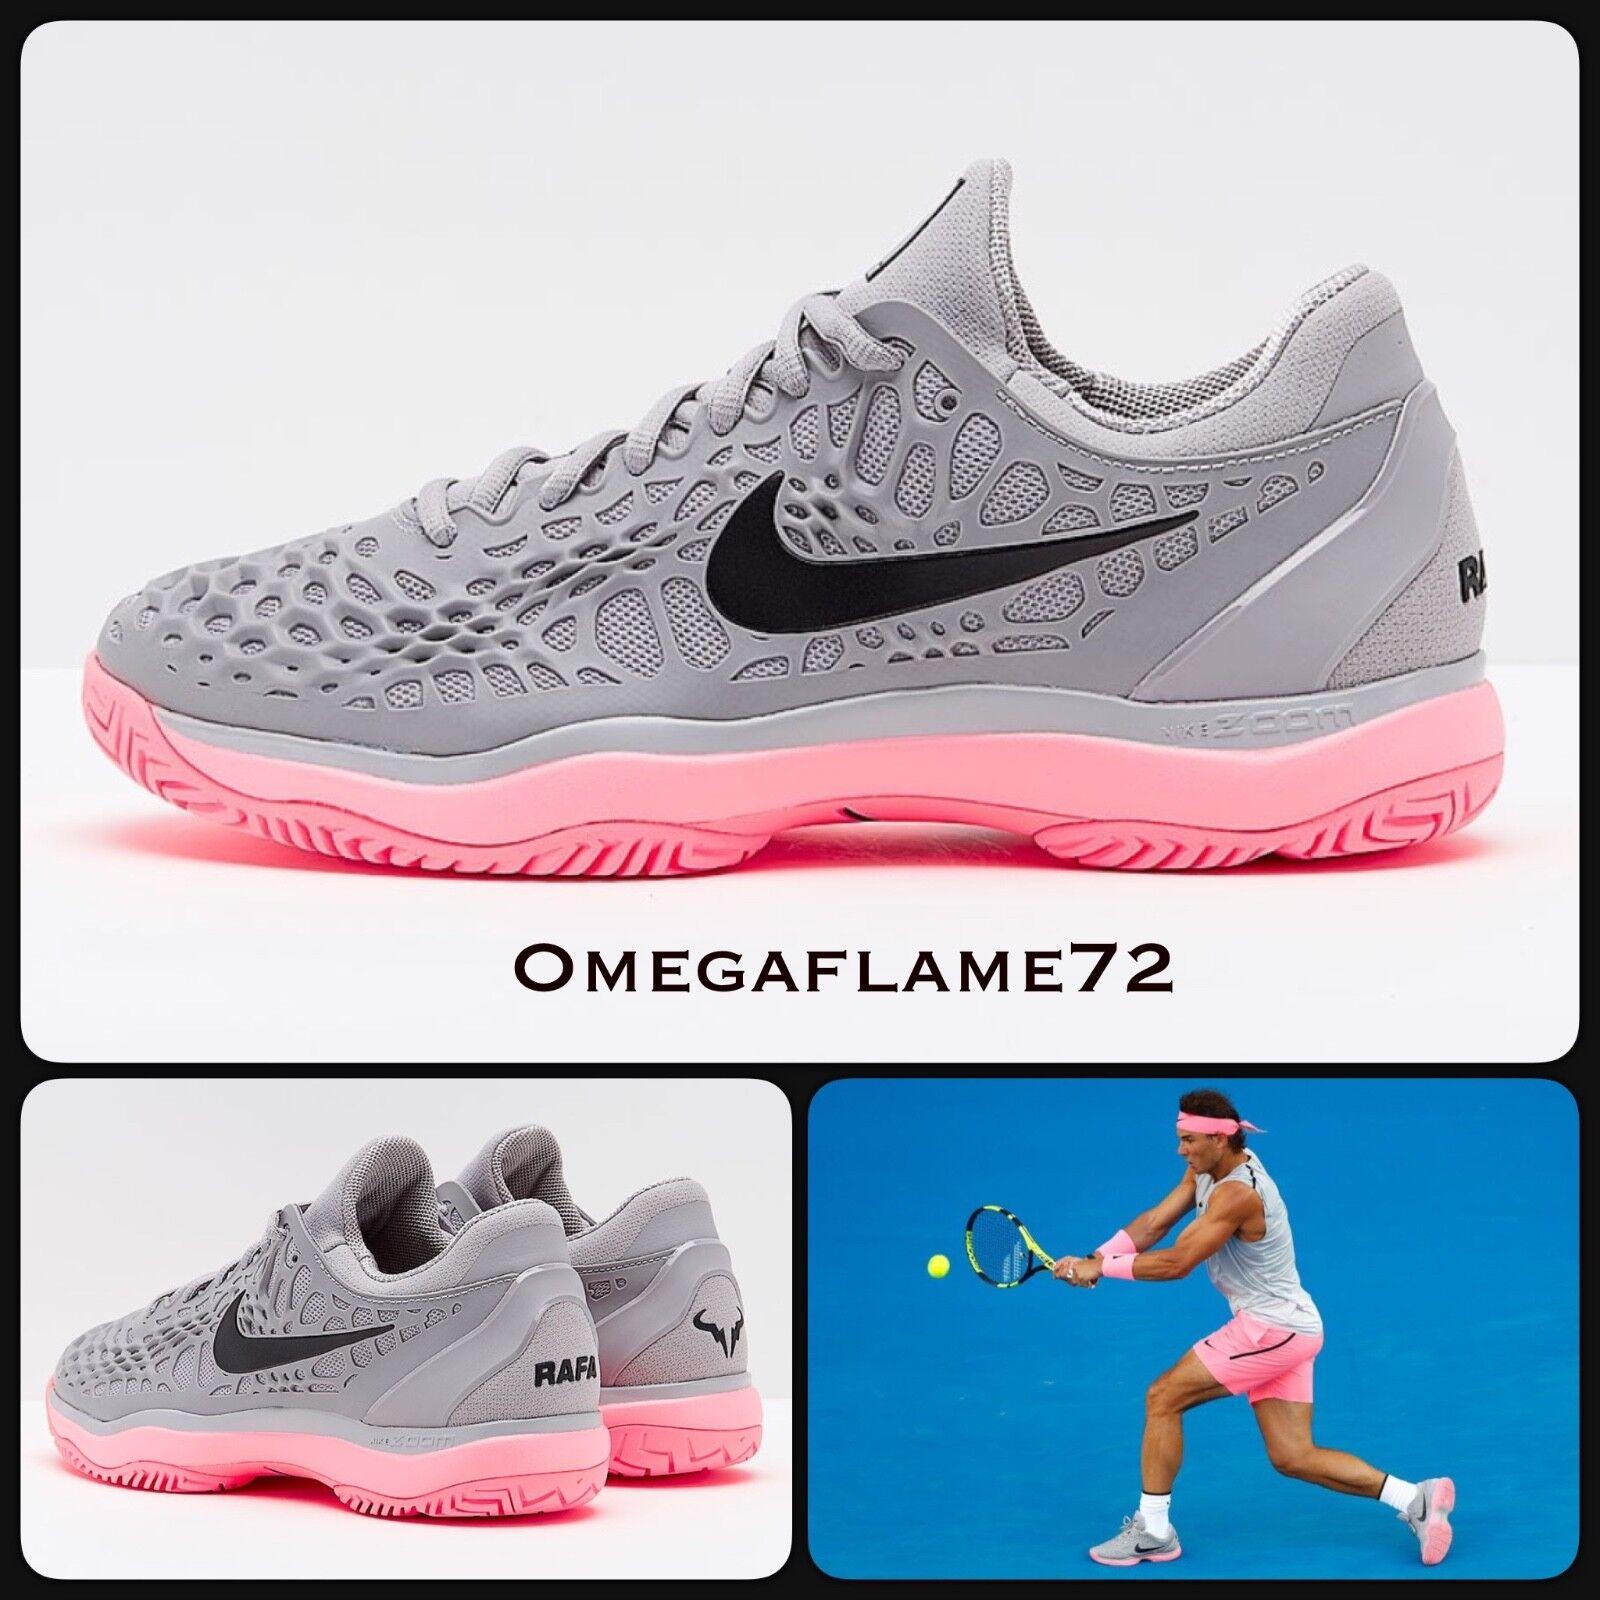 Nike Zoom Cage 3 Rafa Rafa Rafa Nadal Tennis Chaussure,8.5 EU 43 US 9.5 918192-013 0a60cc